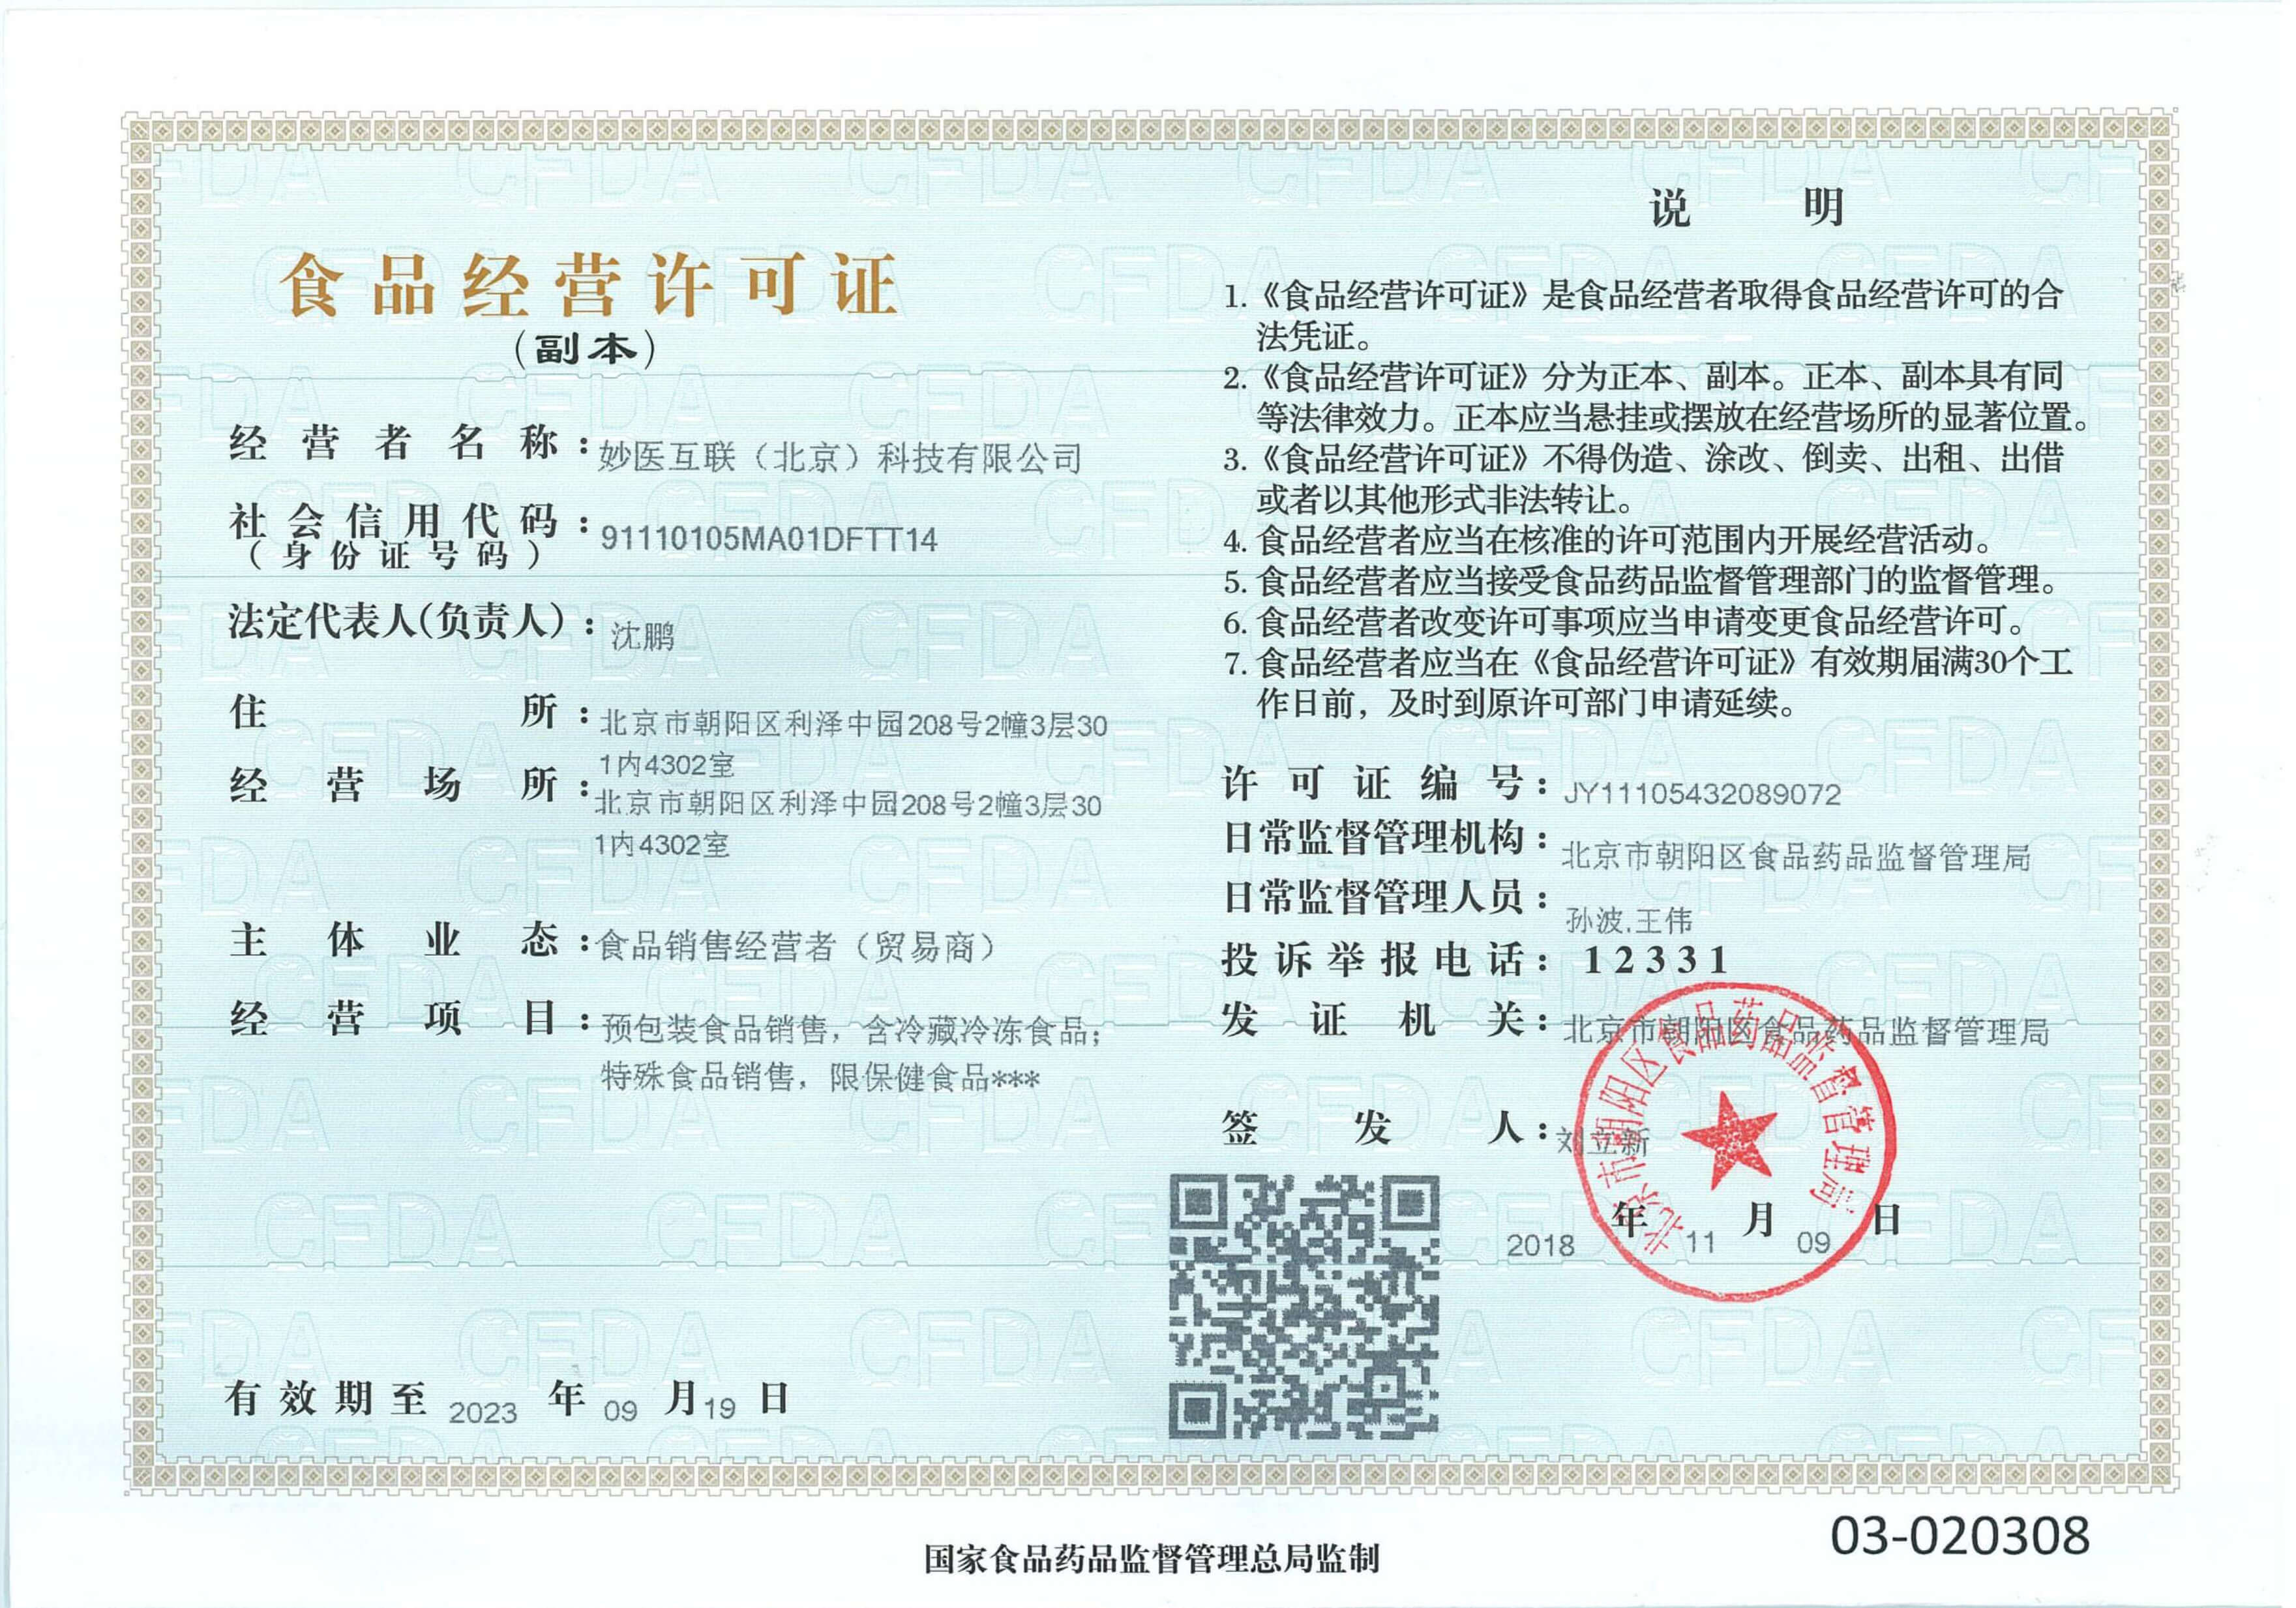 食品经营许可证JY11105432089072